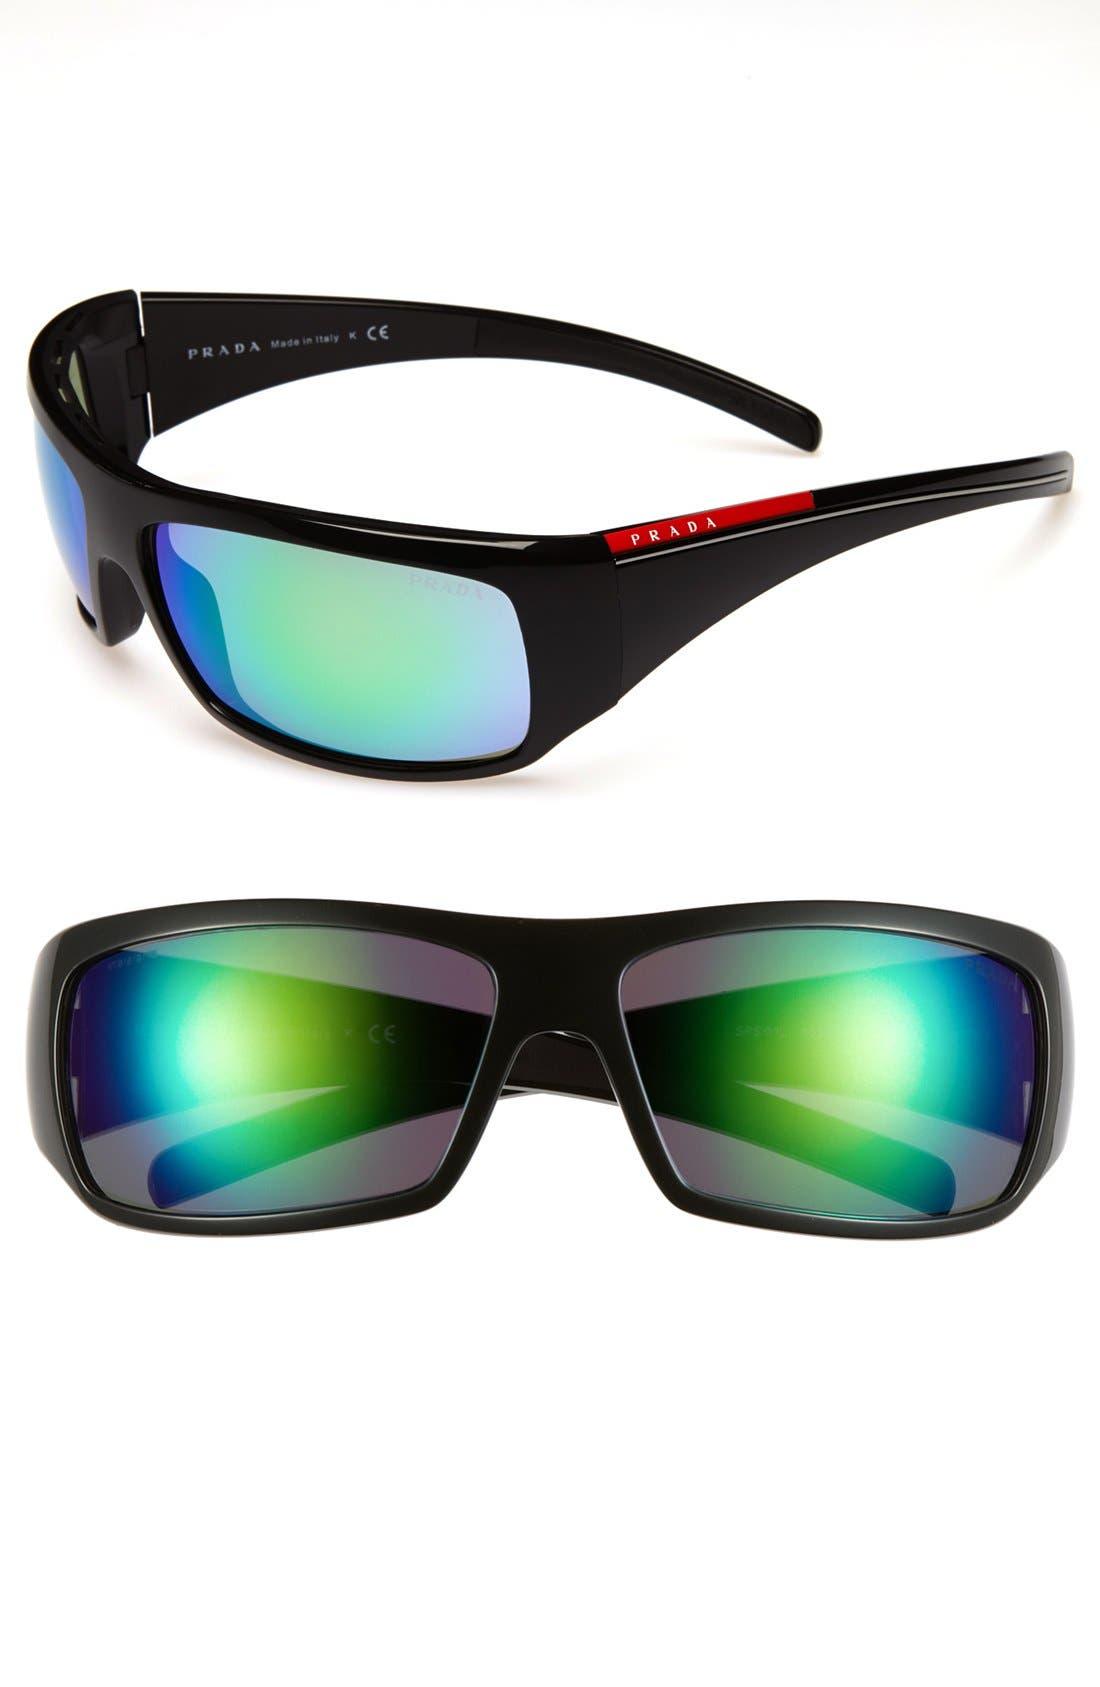 Alternate Image 1 Selected - Prada 'America's Cup Collection' 65mm Wraparound Sunglasses